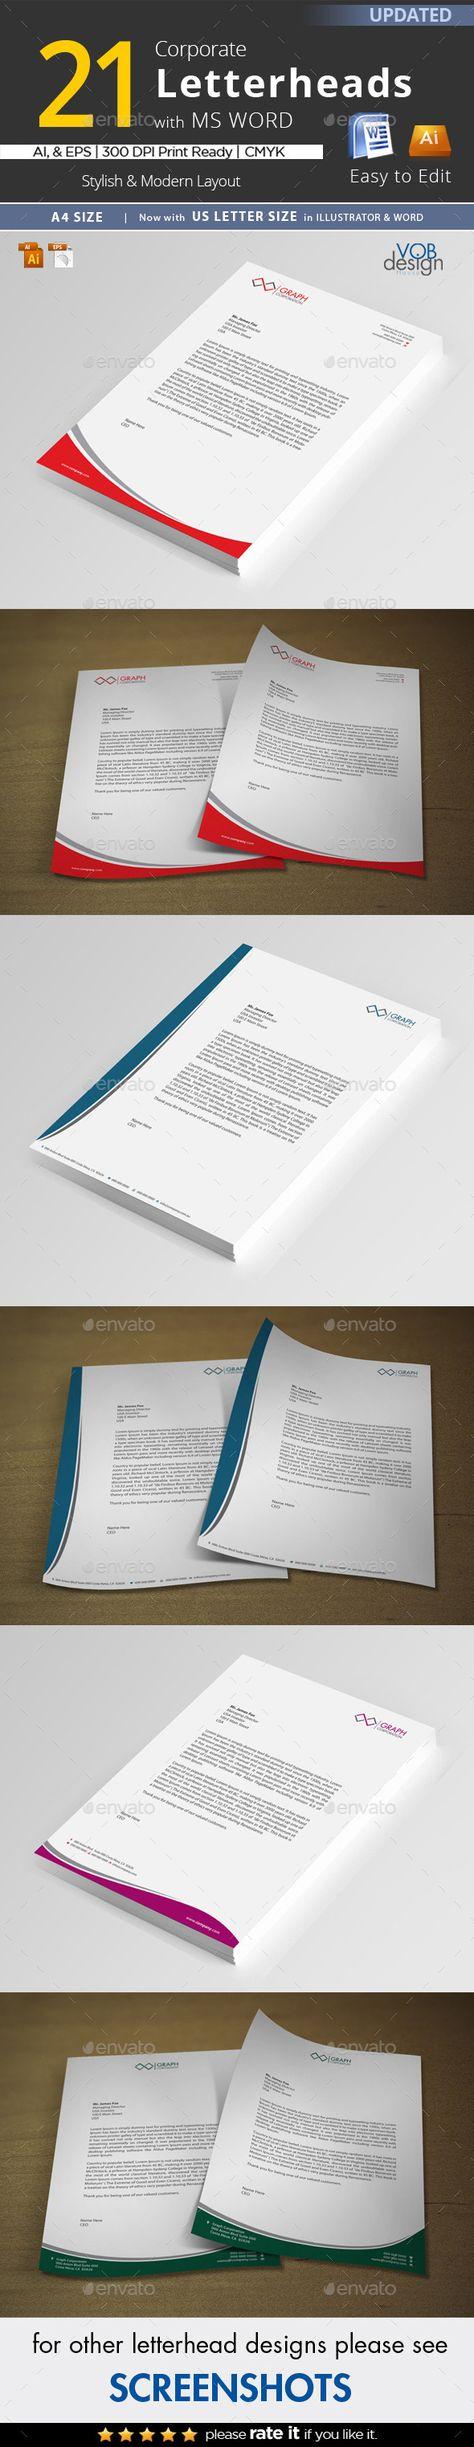 letter format on letterhead%0A      best Letterhead images on Pinterest   Contact paper  Letterhead and  Letterhead design